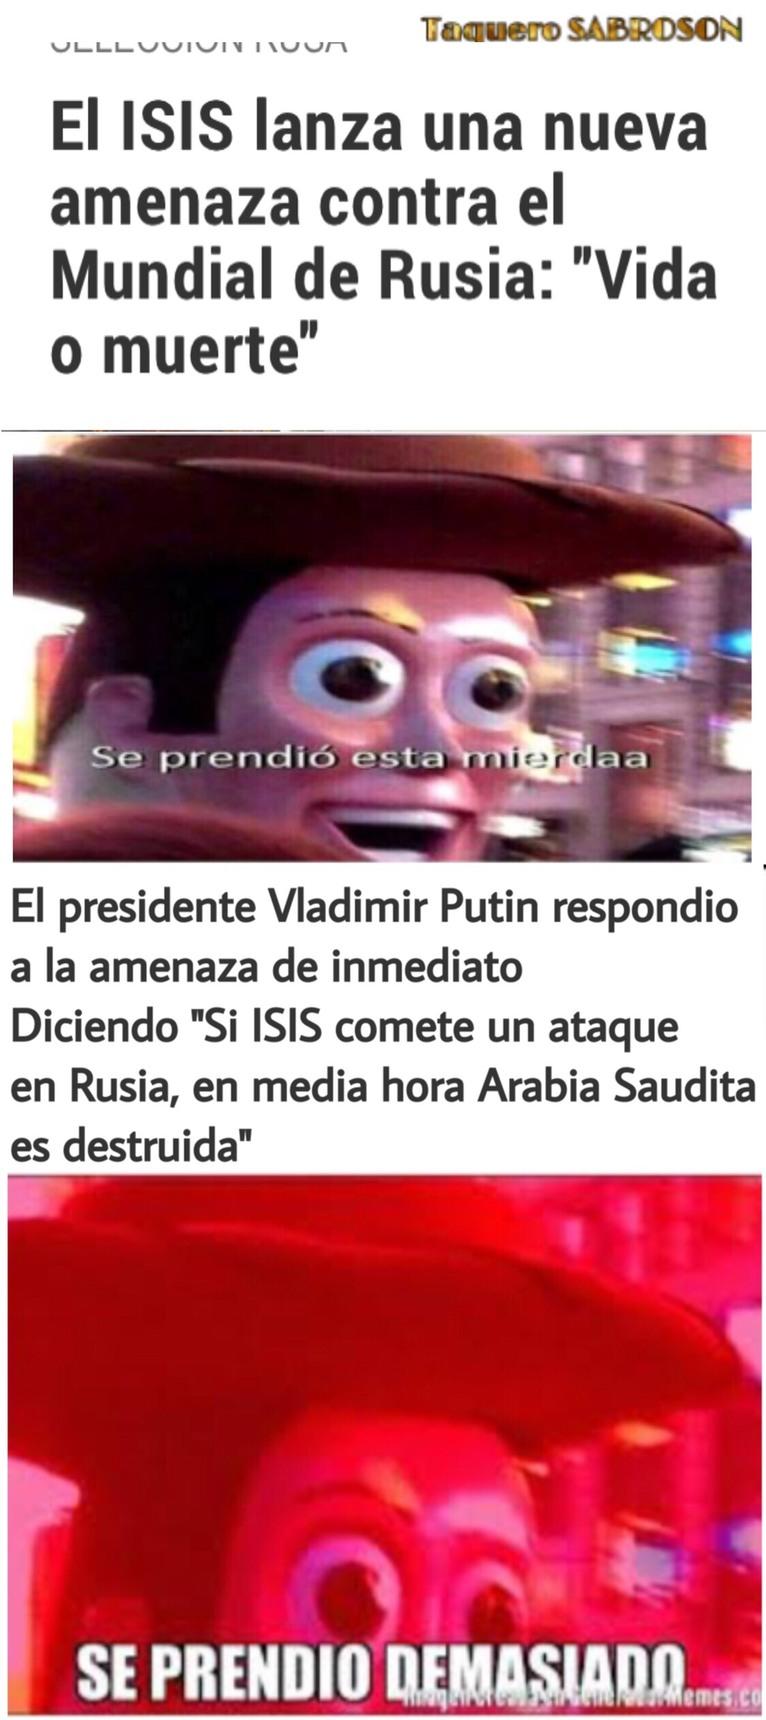 Al final todos los terroristas van a explotar *badabum* *tss* - meme